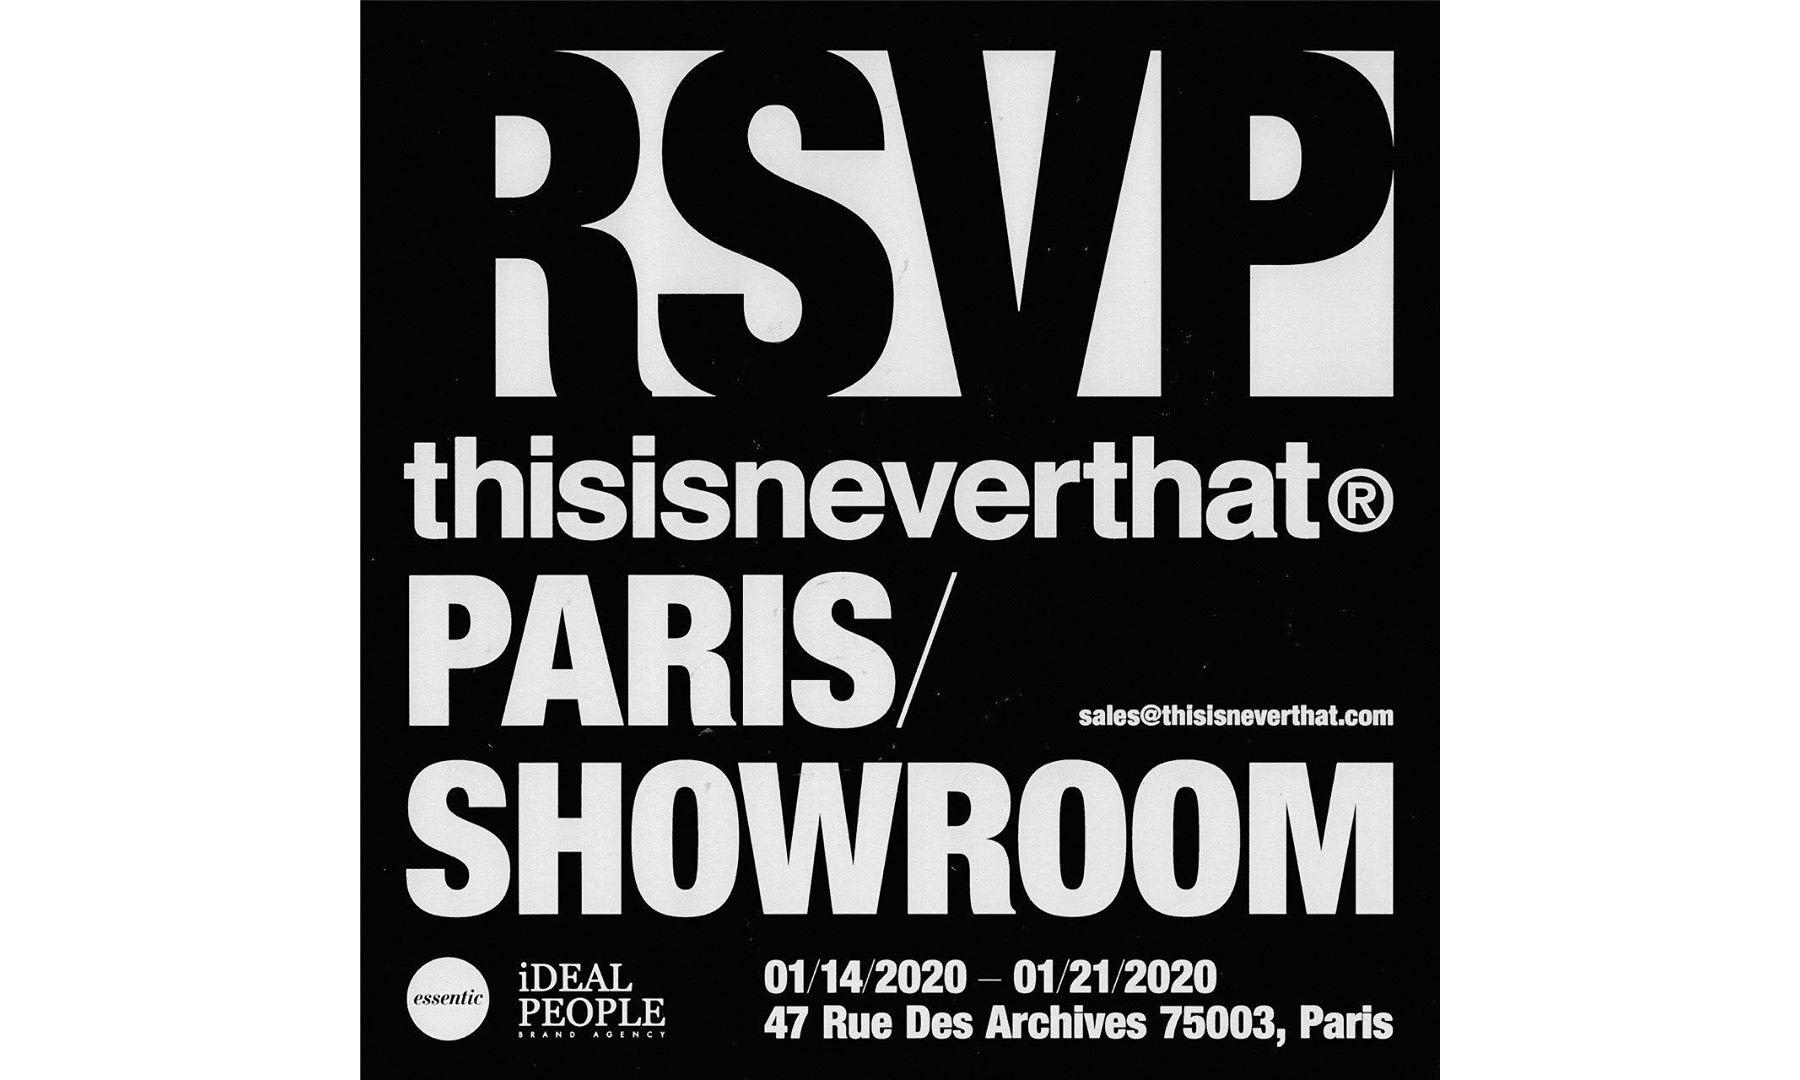 thisisneverthat 巴黎 Showroom 现已开放预约